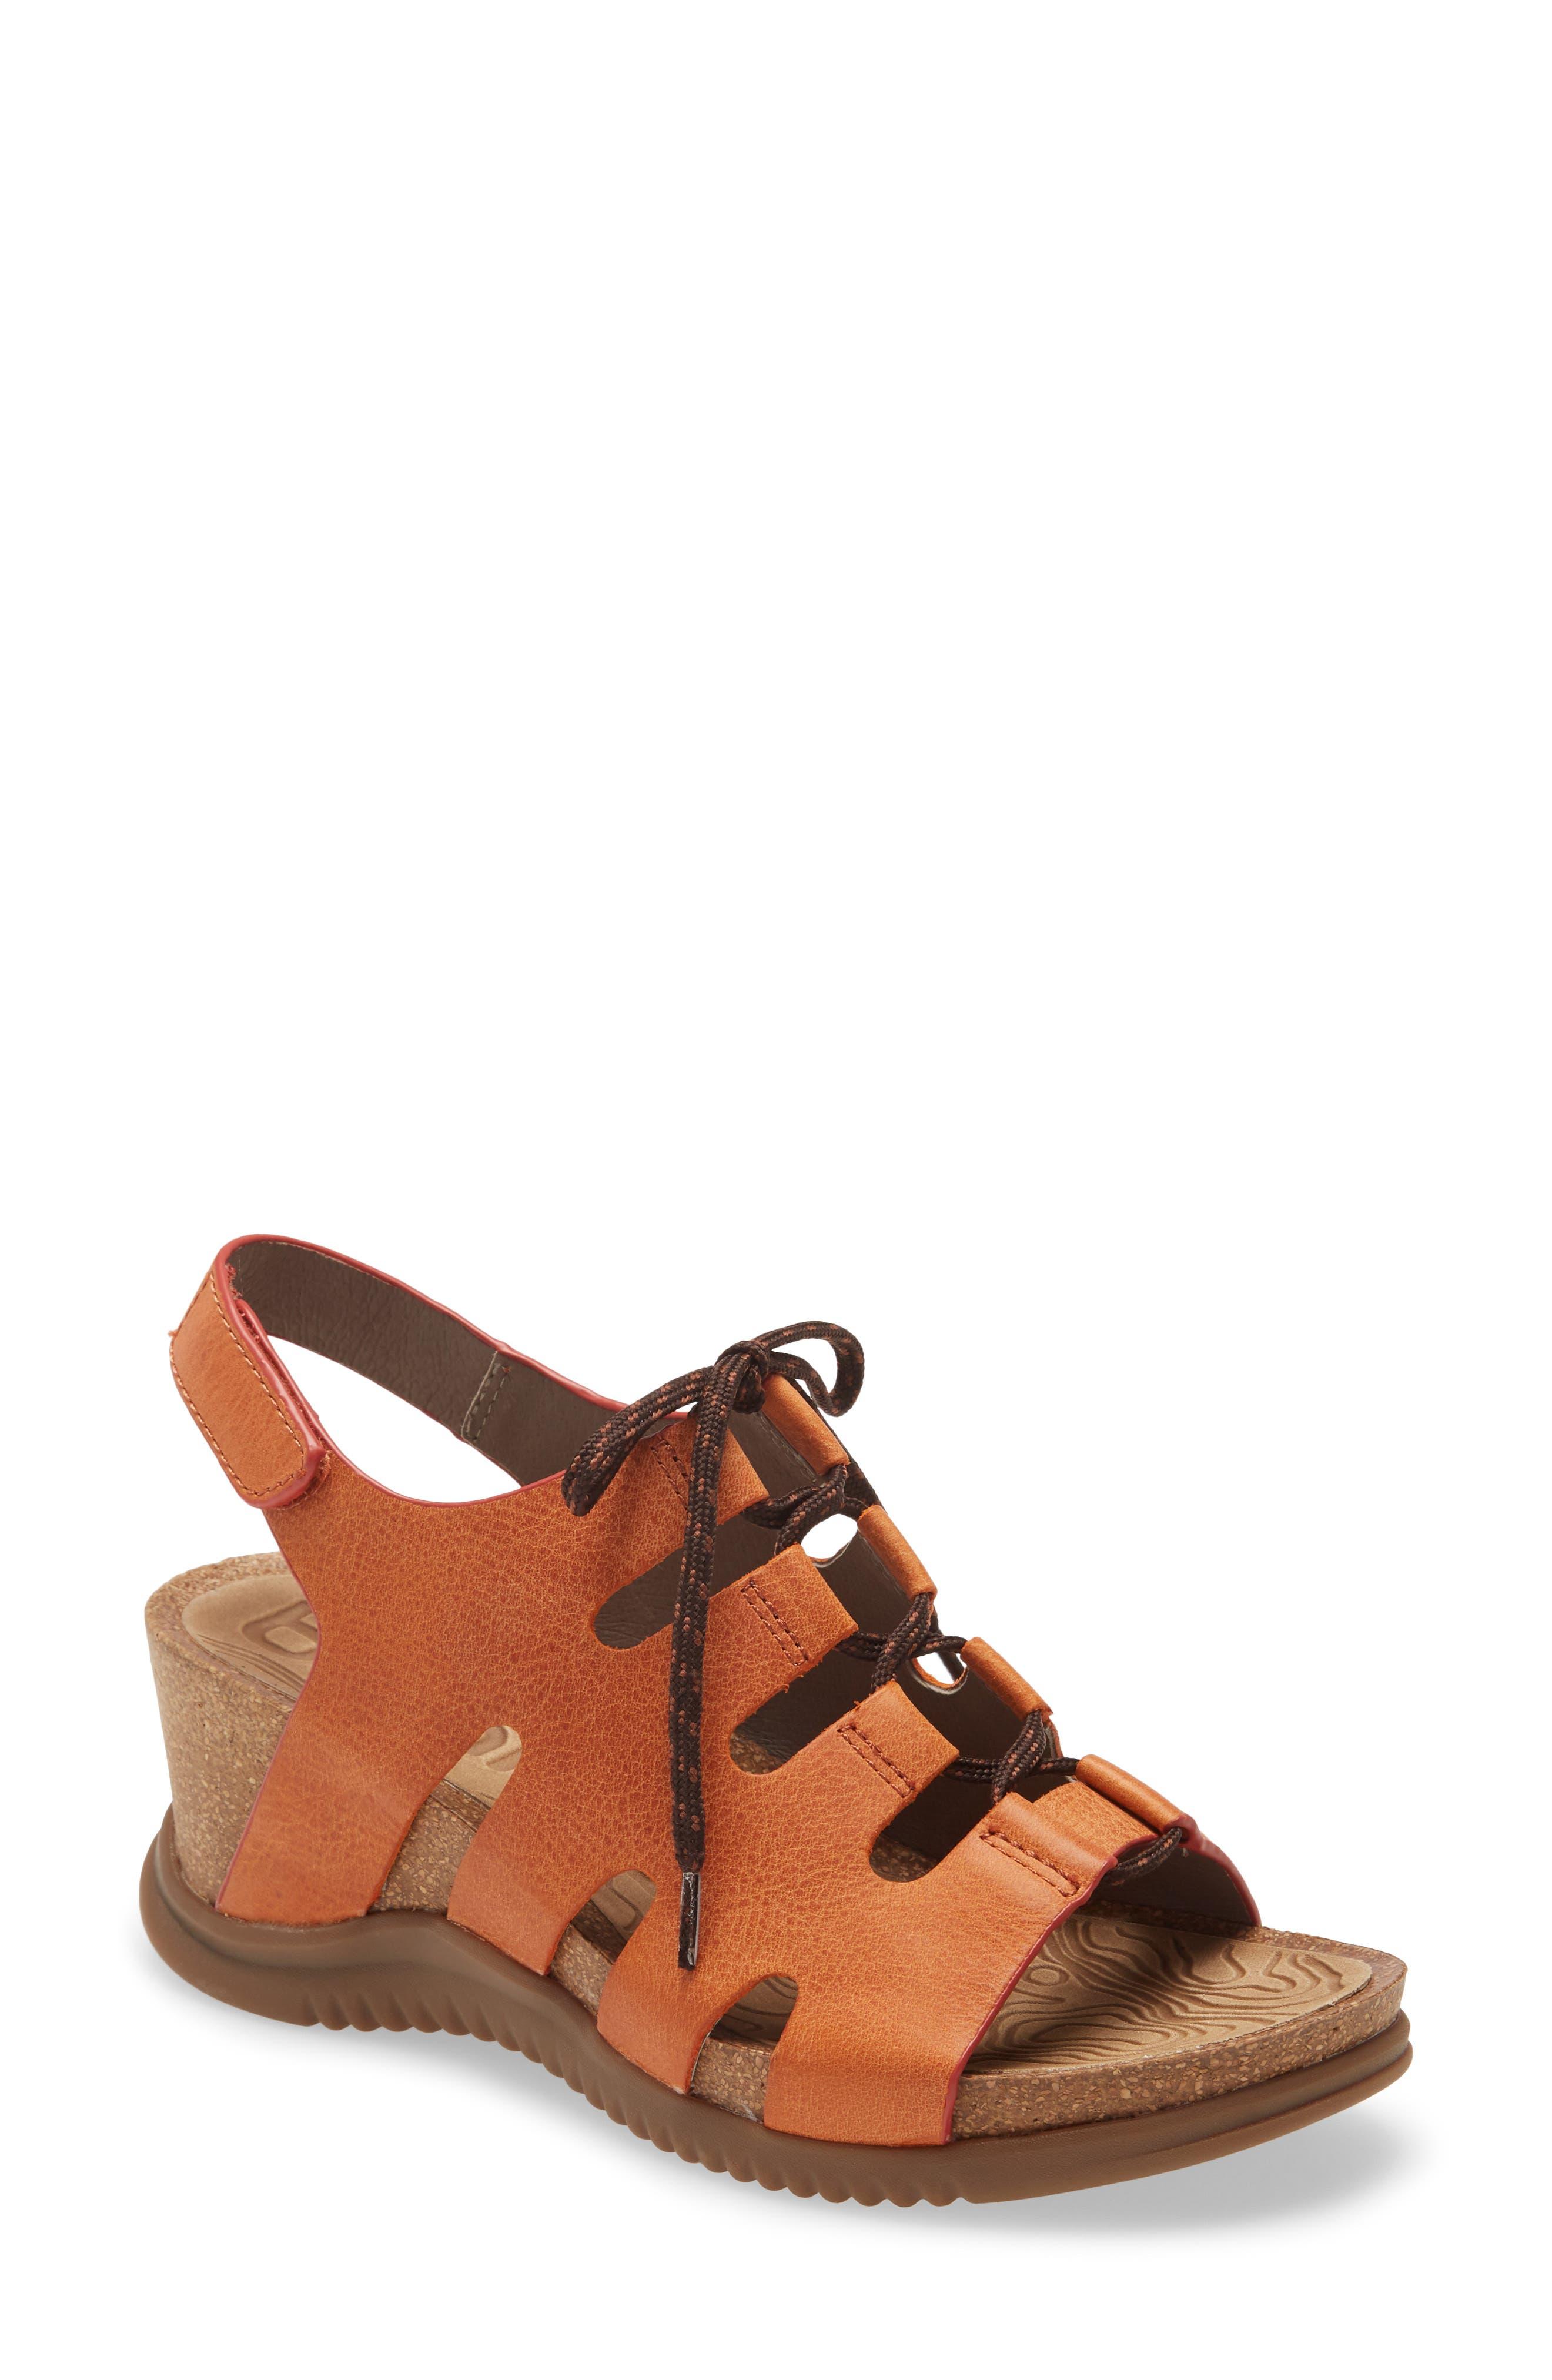 Women's Bionica Sorena Ghillie Wedge Sandal, Size 11 M - Orange